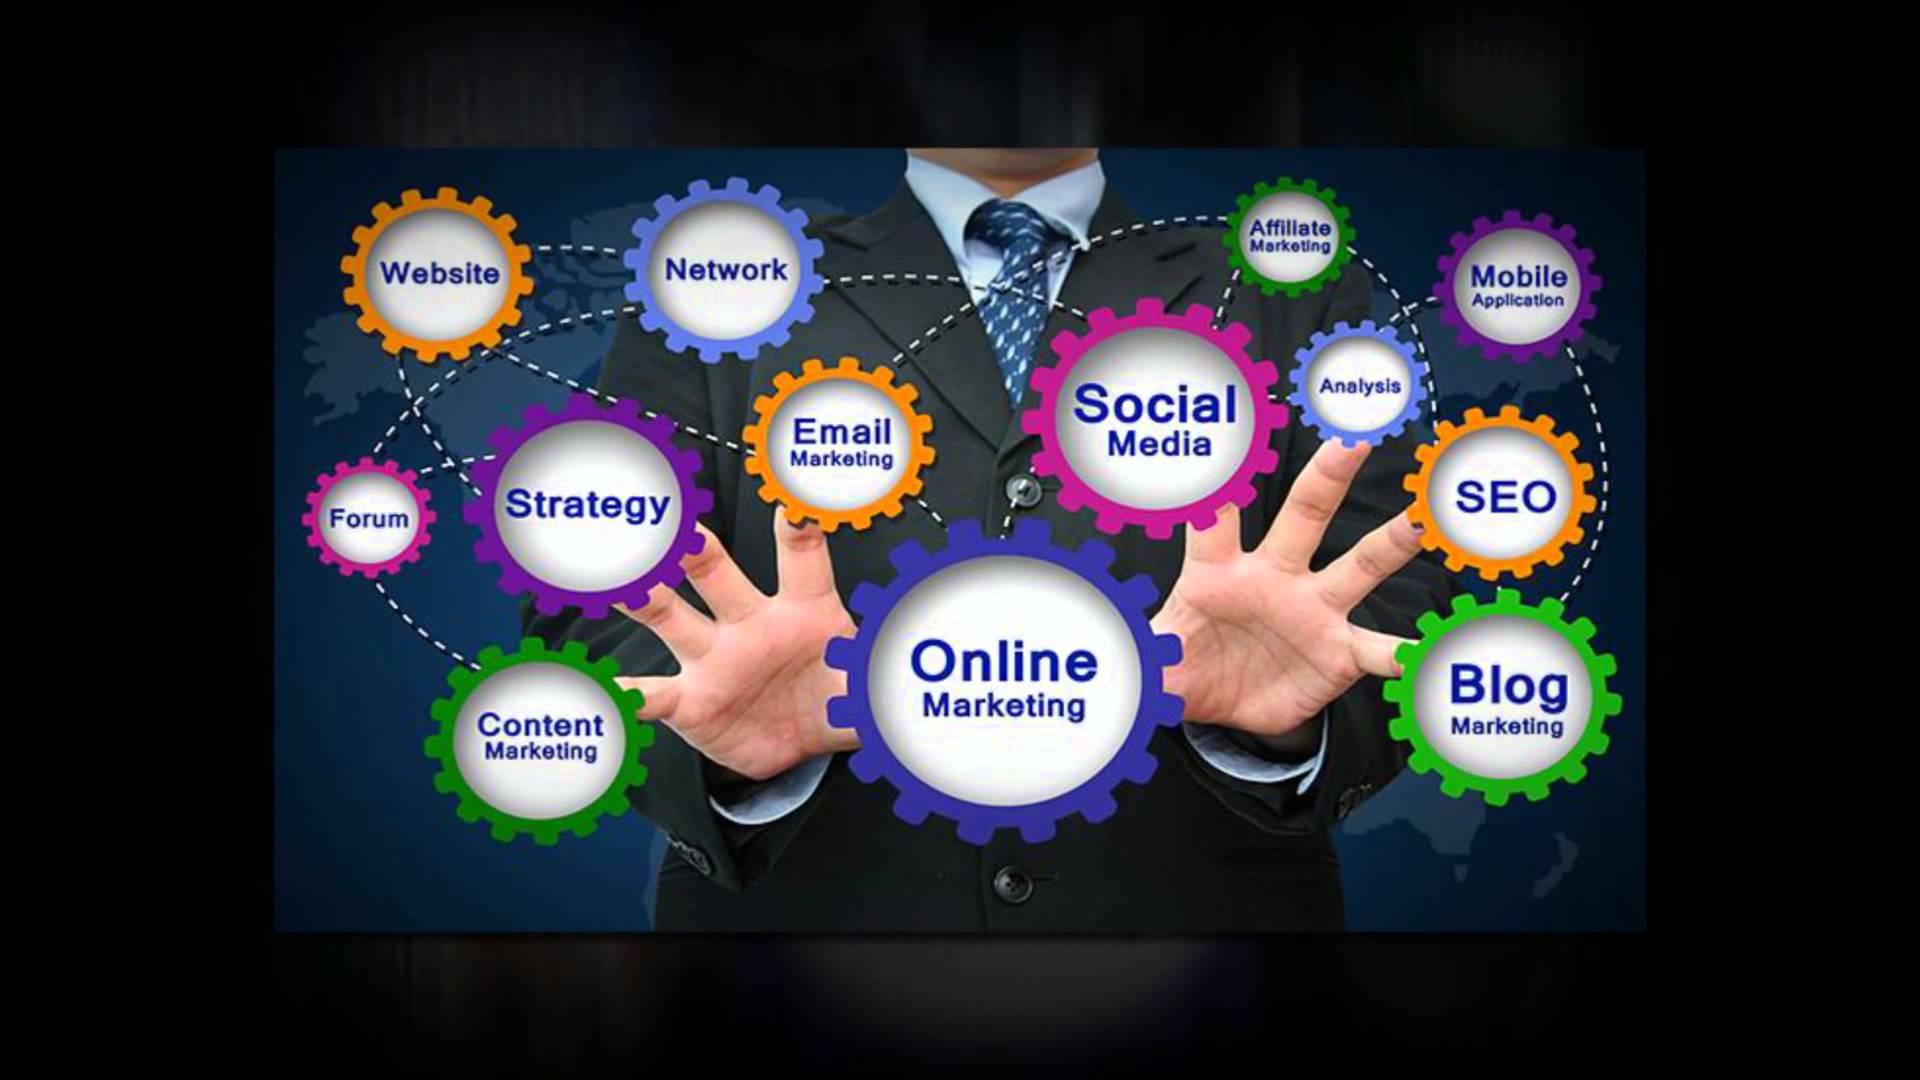 Social Media Executive - Dubai, UAE - Amaken Recruitment